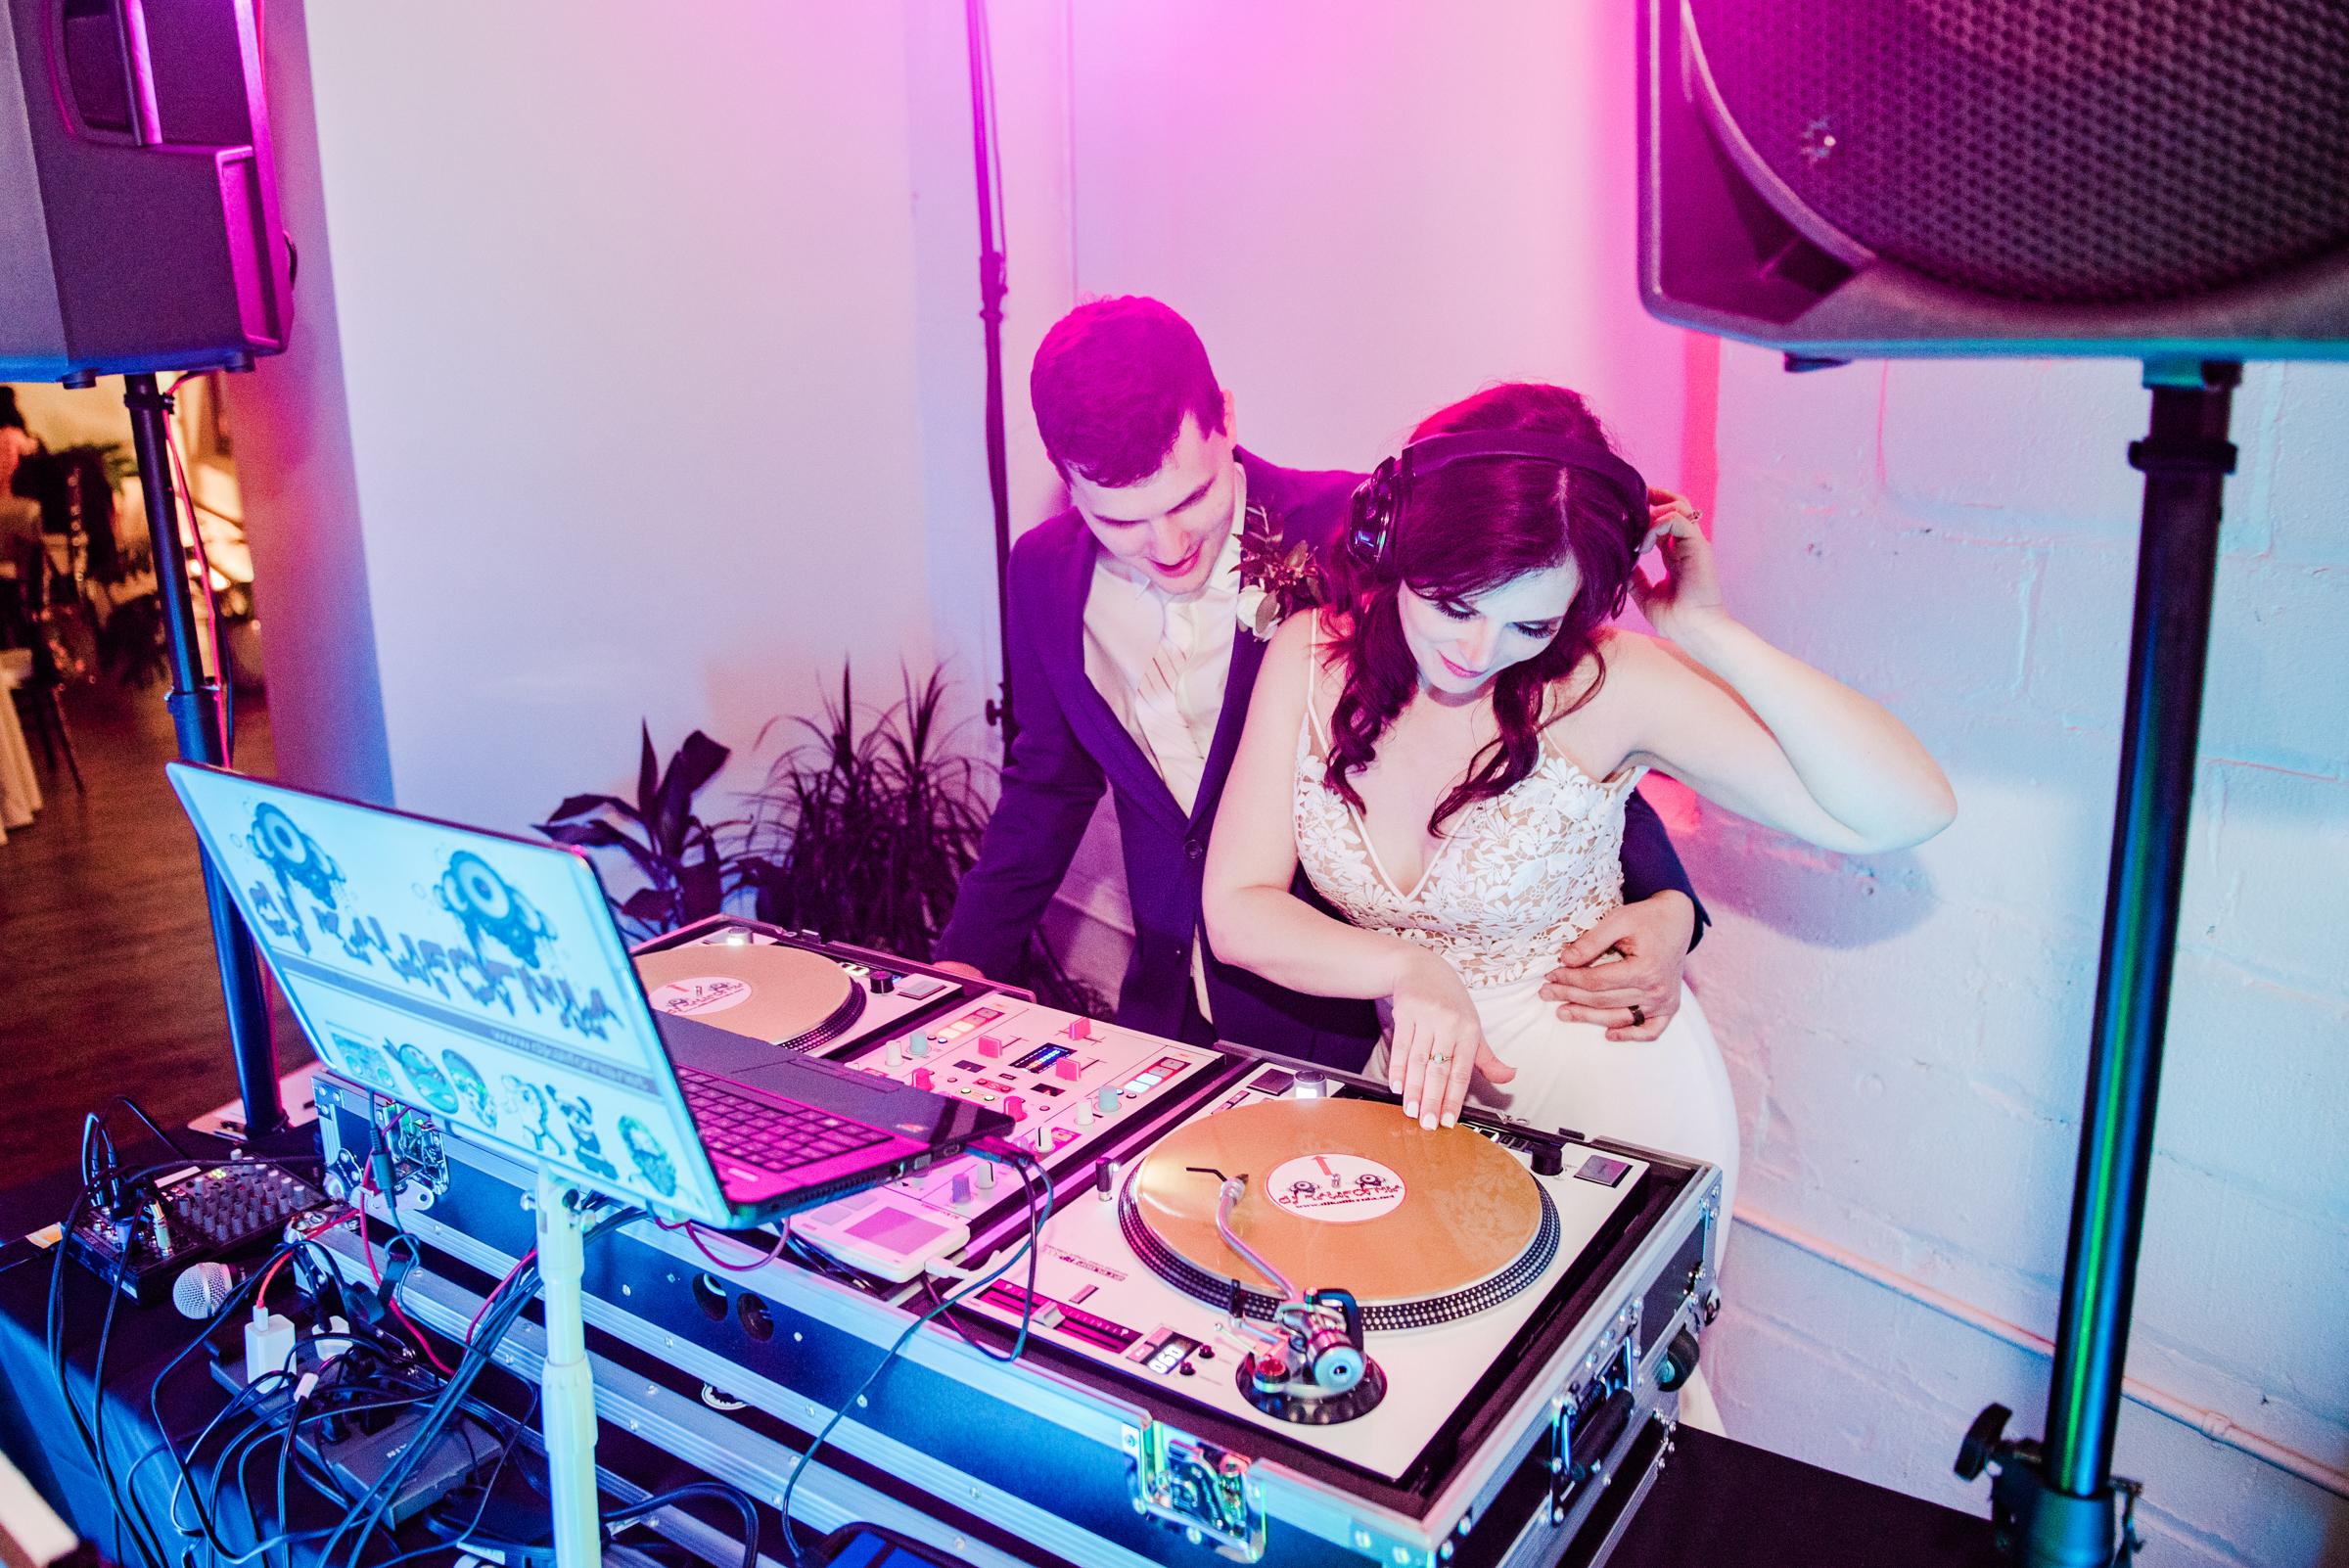 The_Arbor_LoftRochester_Wedding_JILL_STUDIO_Rochester_NY_Photographer_205823.jpg